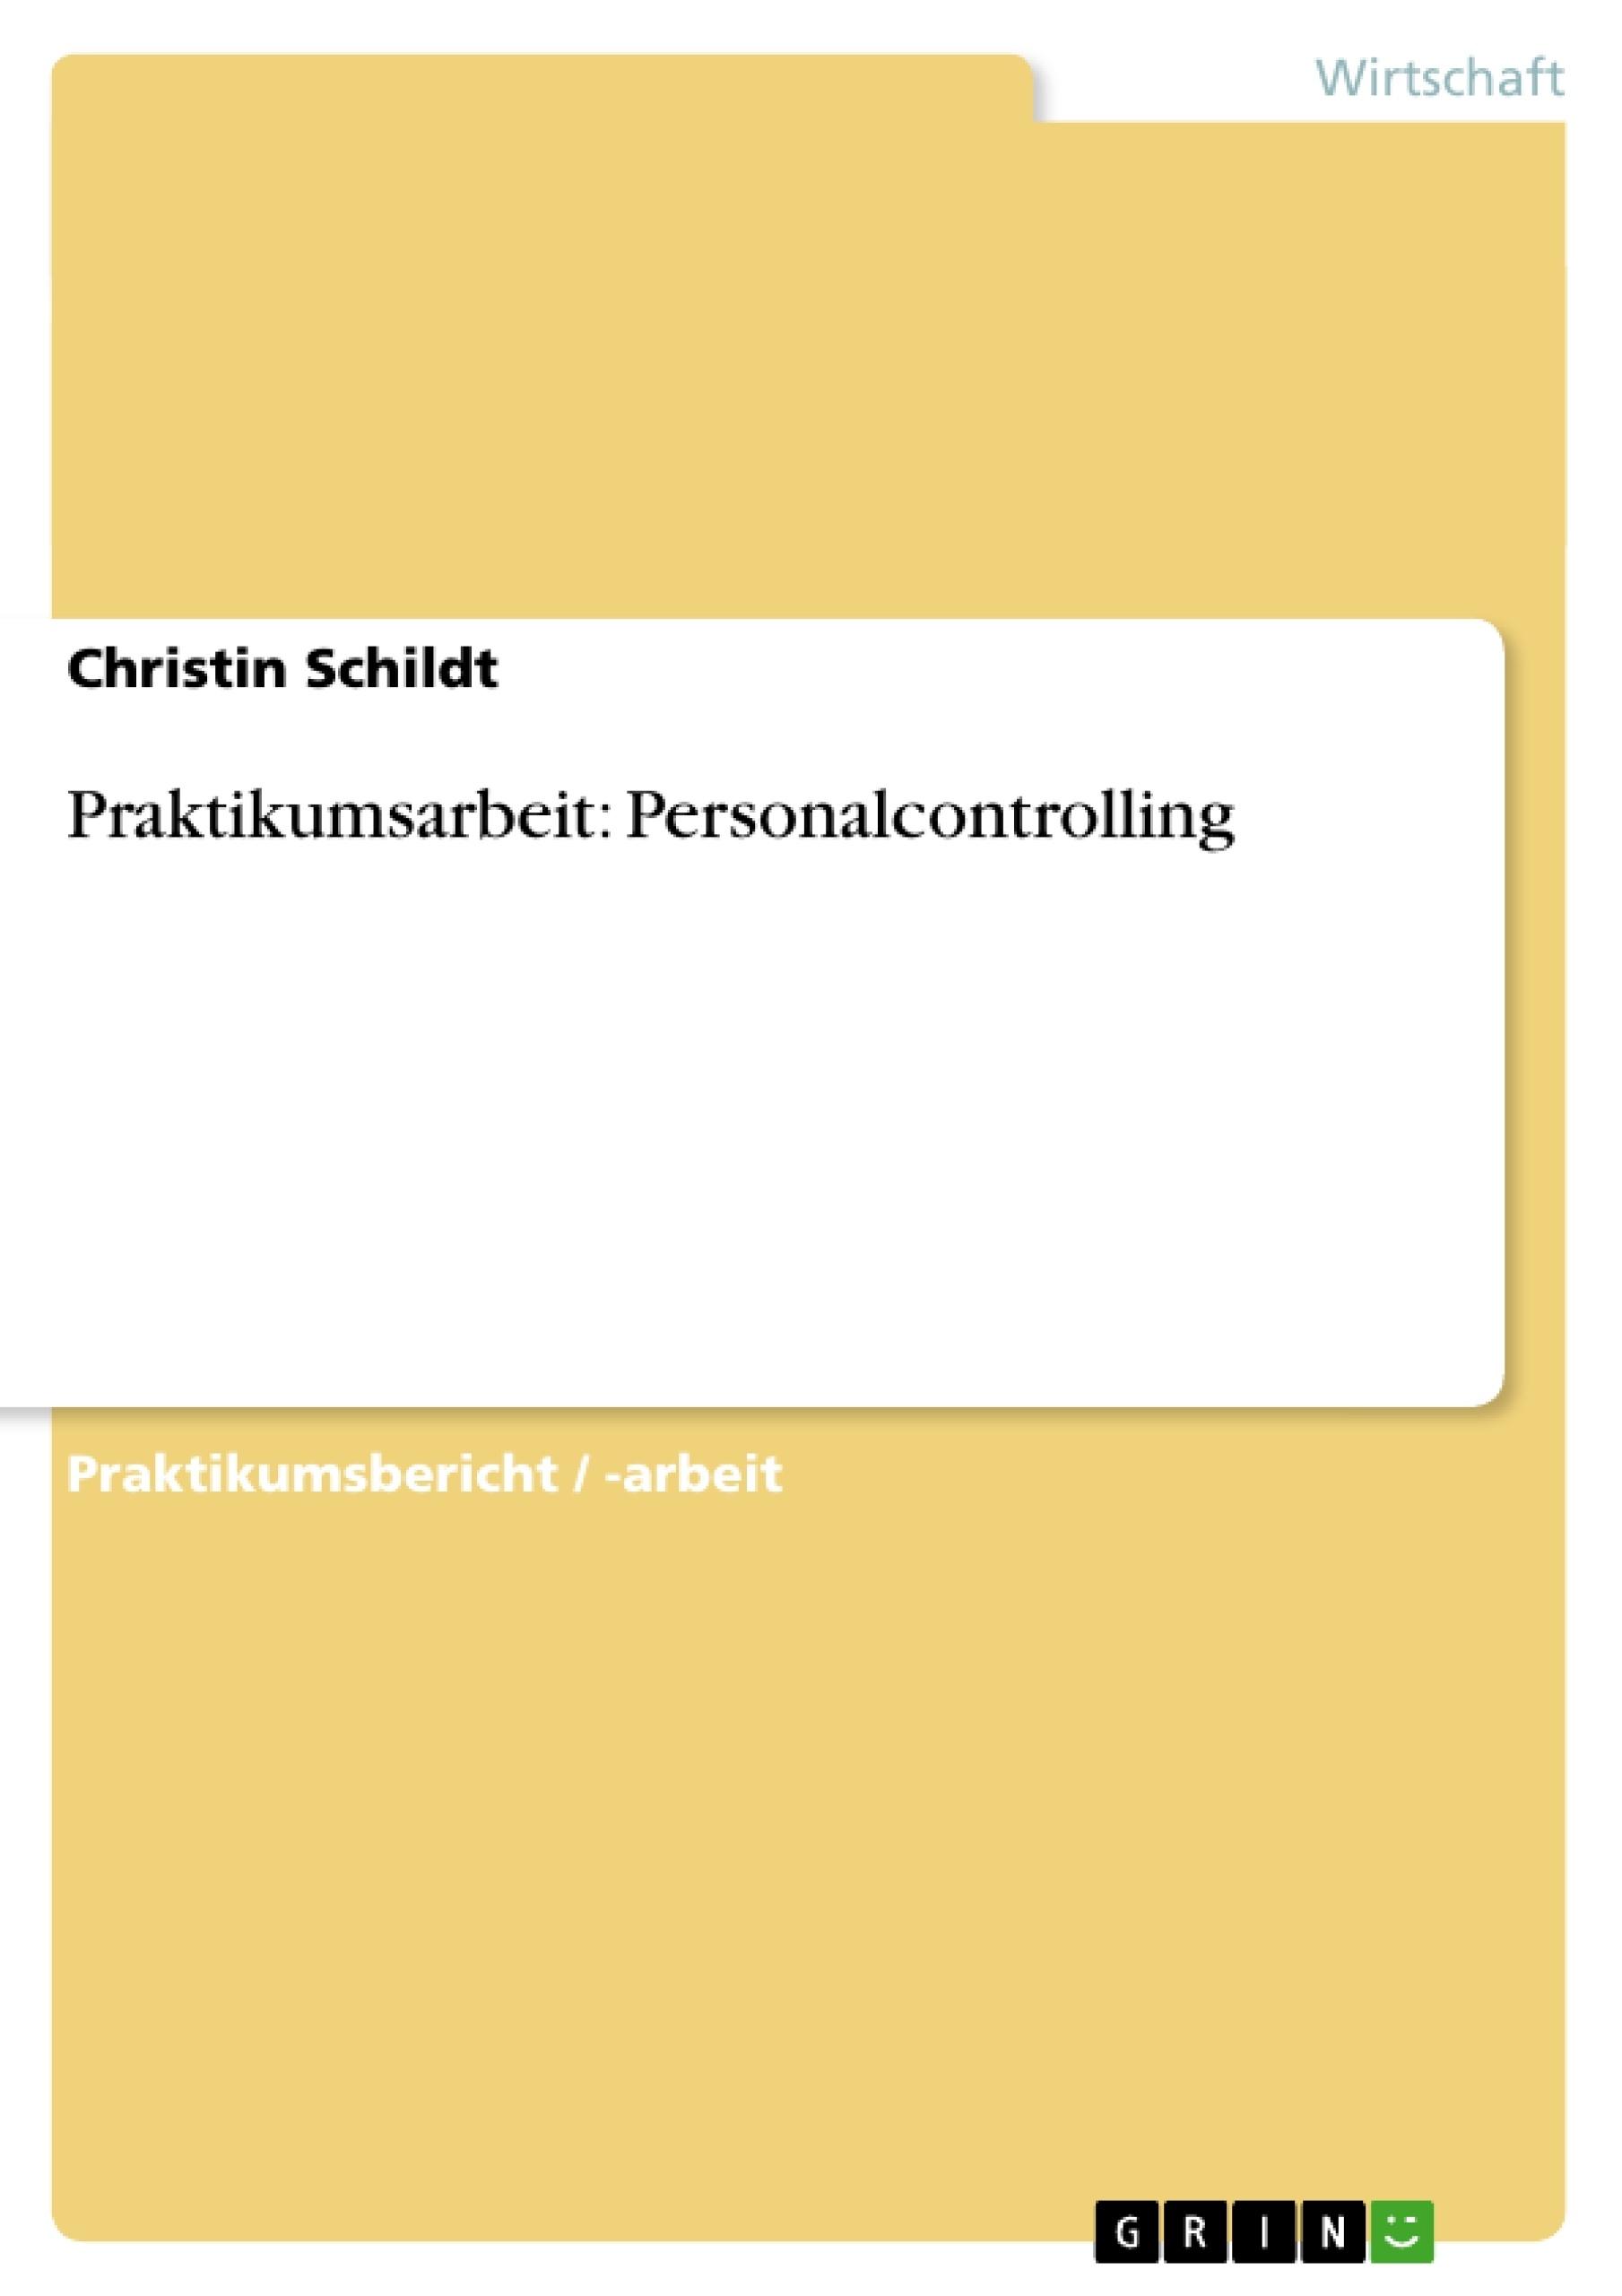 Titel: Praktikumsarbeit: Personalcontrolling